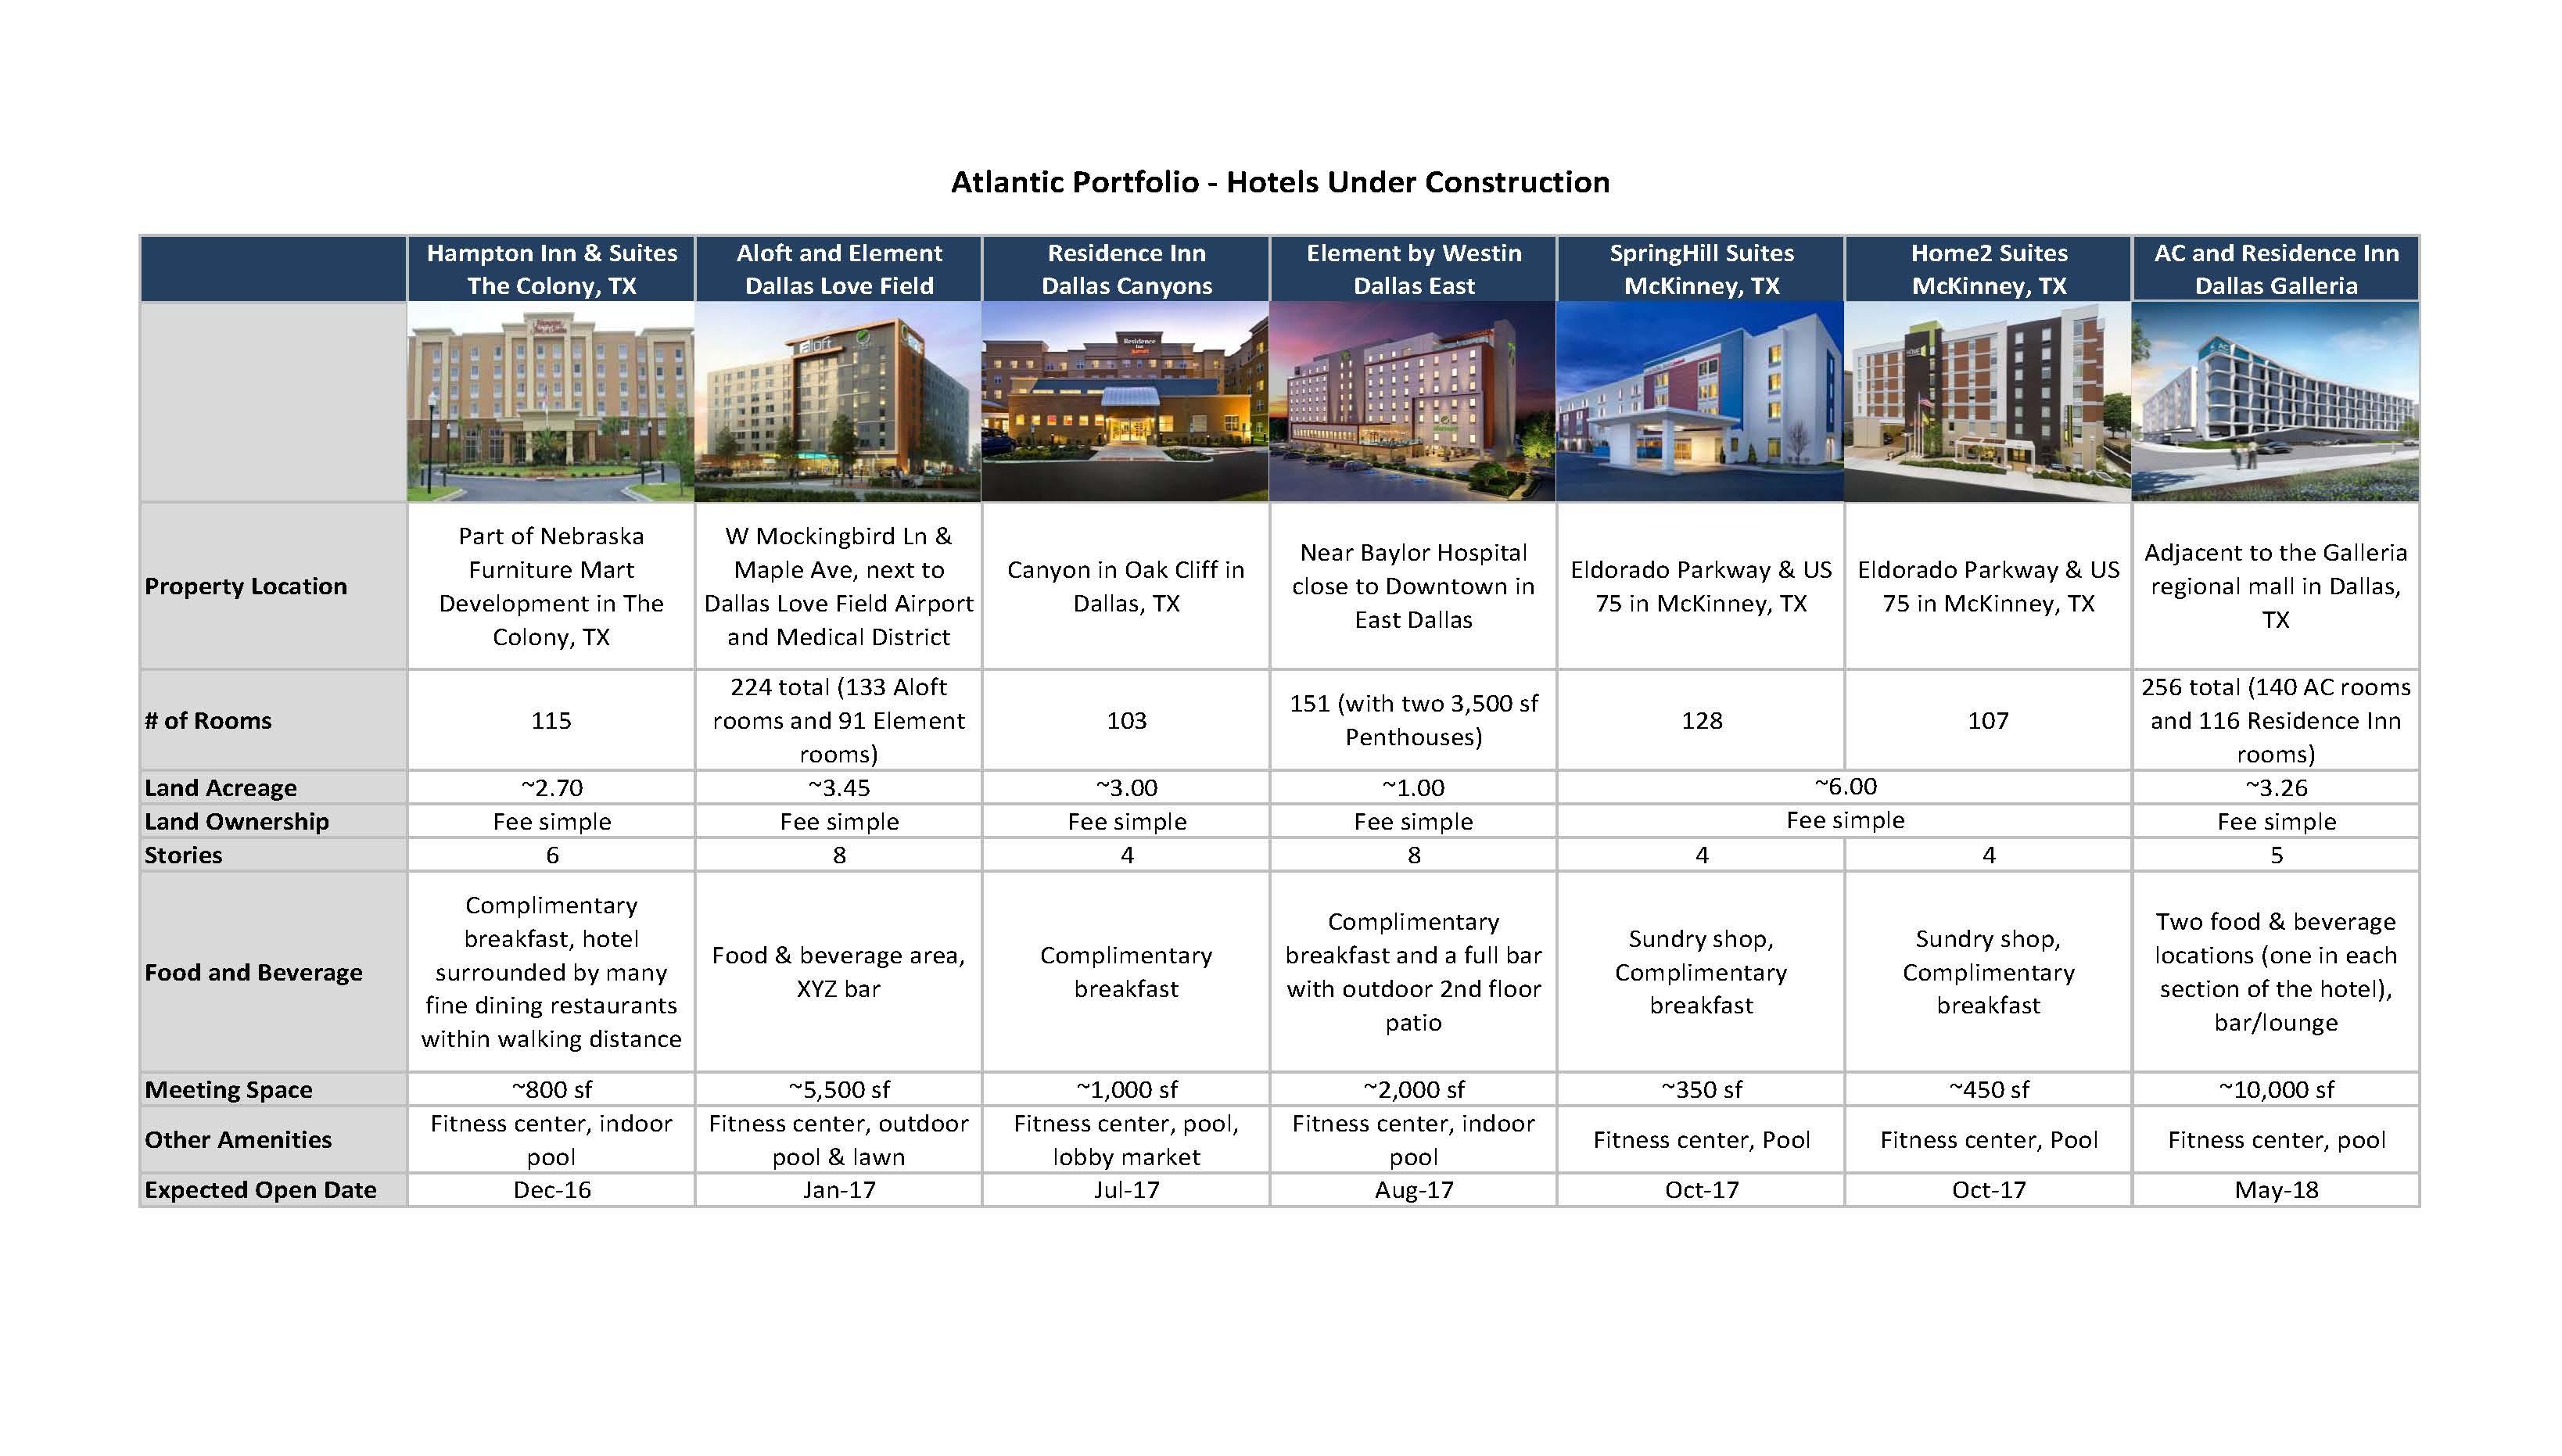 Atlantic Hotels Under Construction No Total Cost